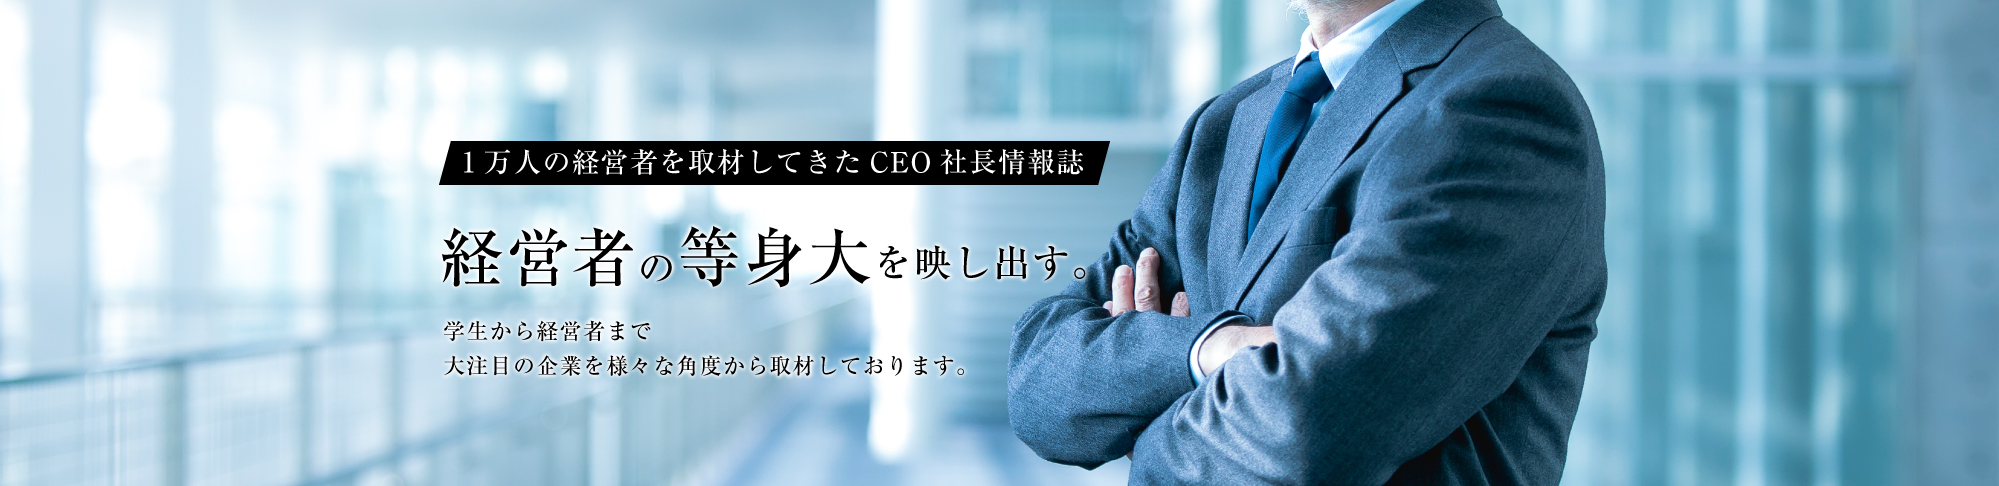 CEO社長情報